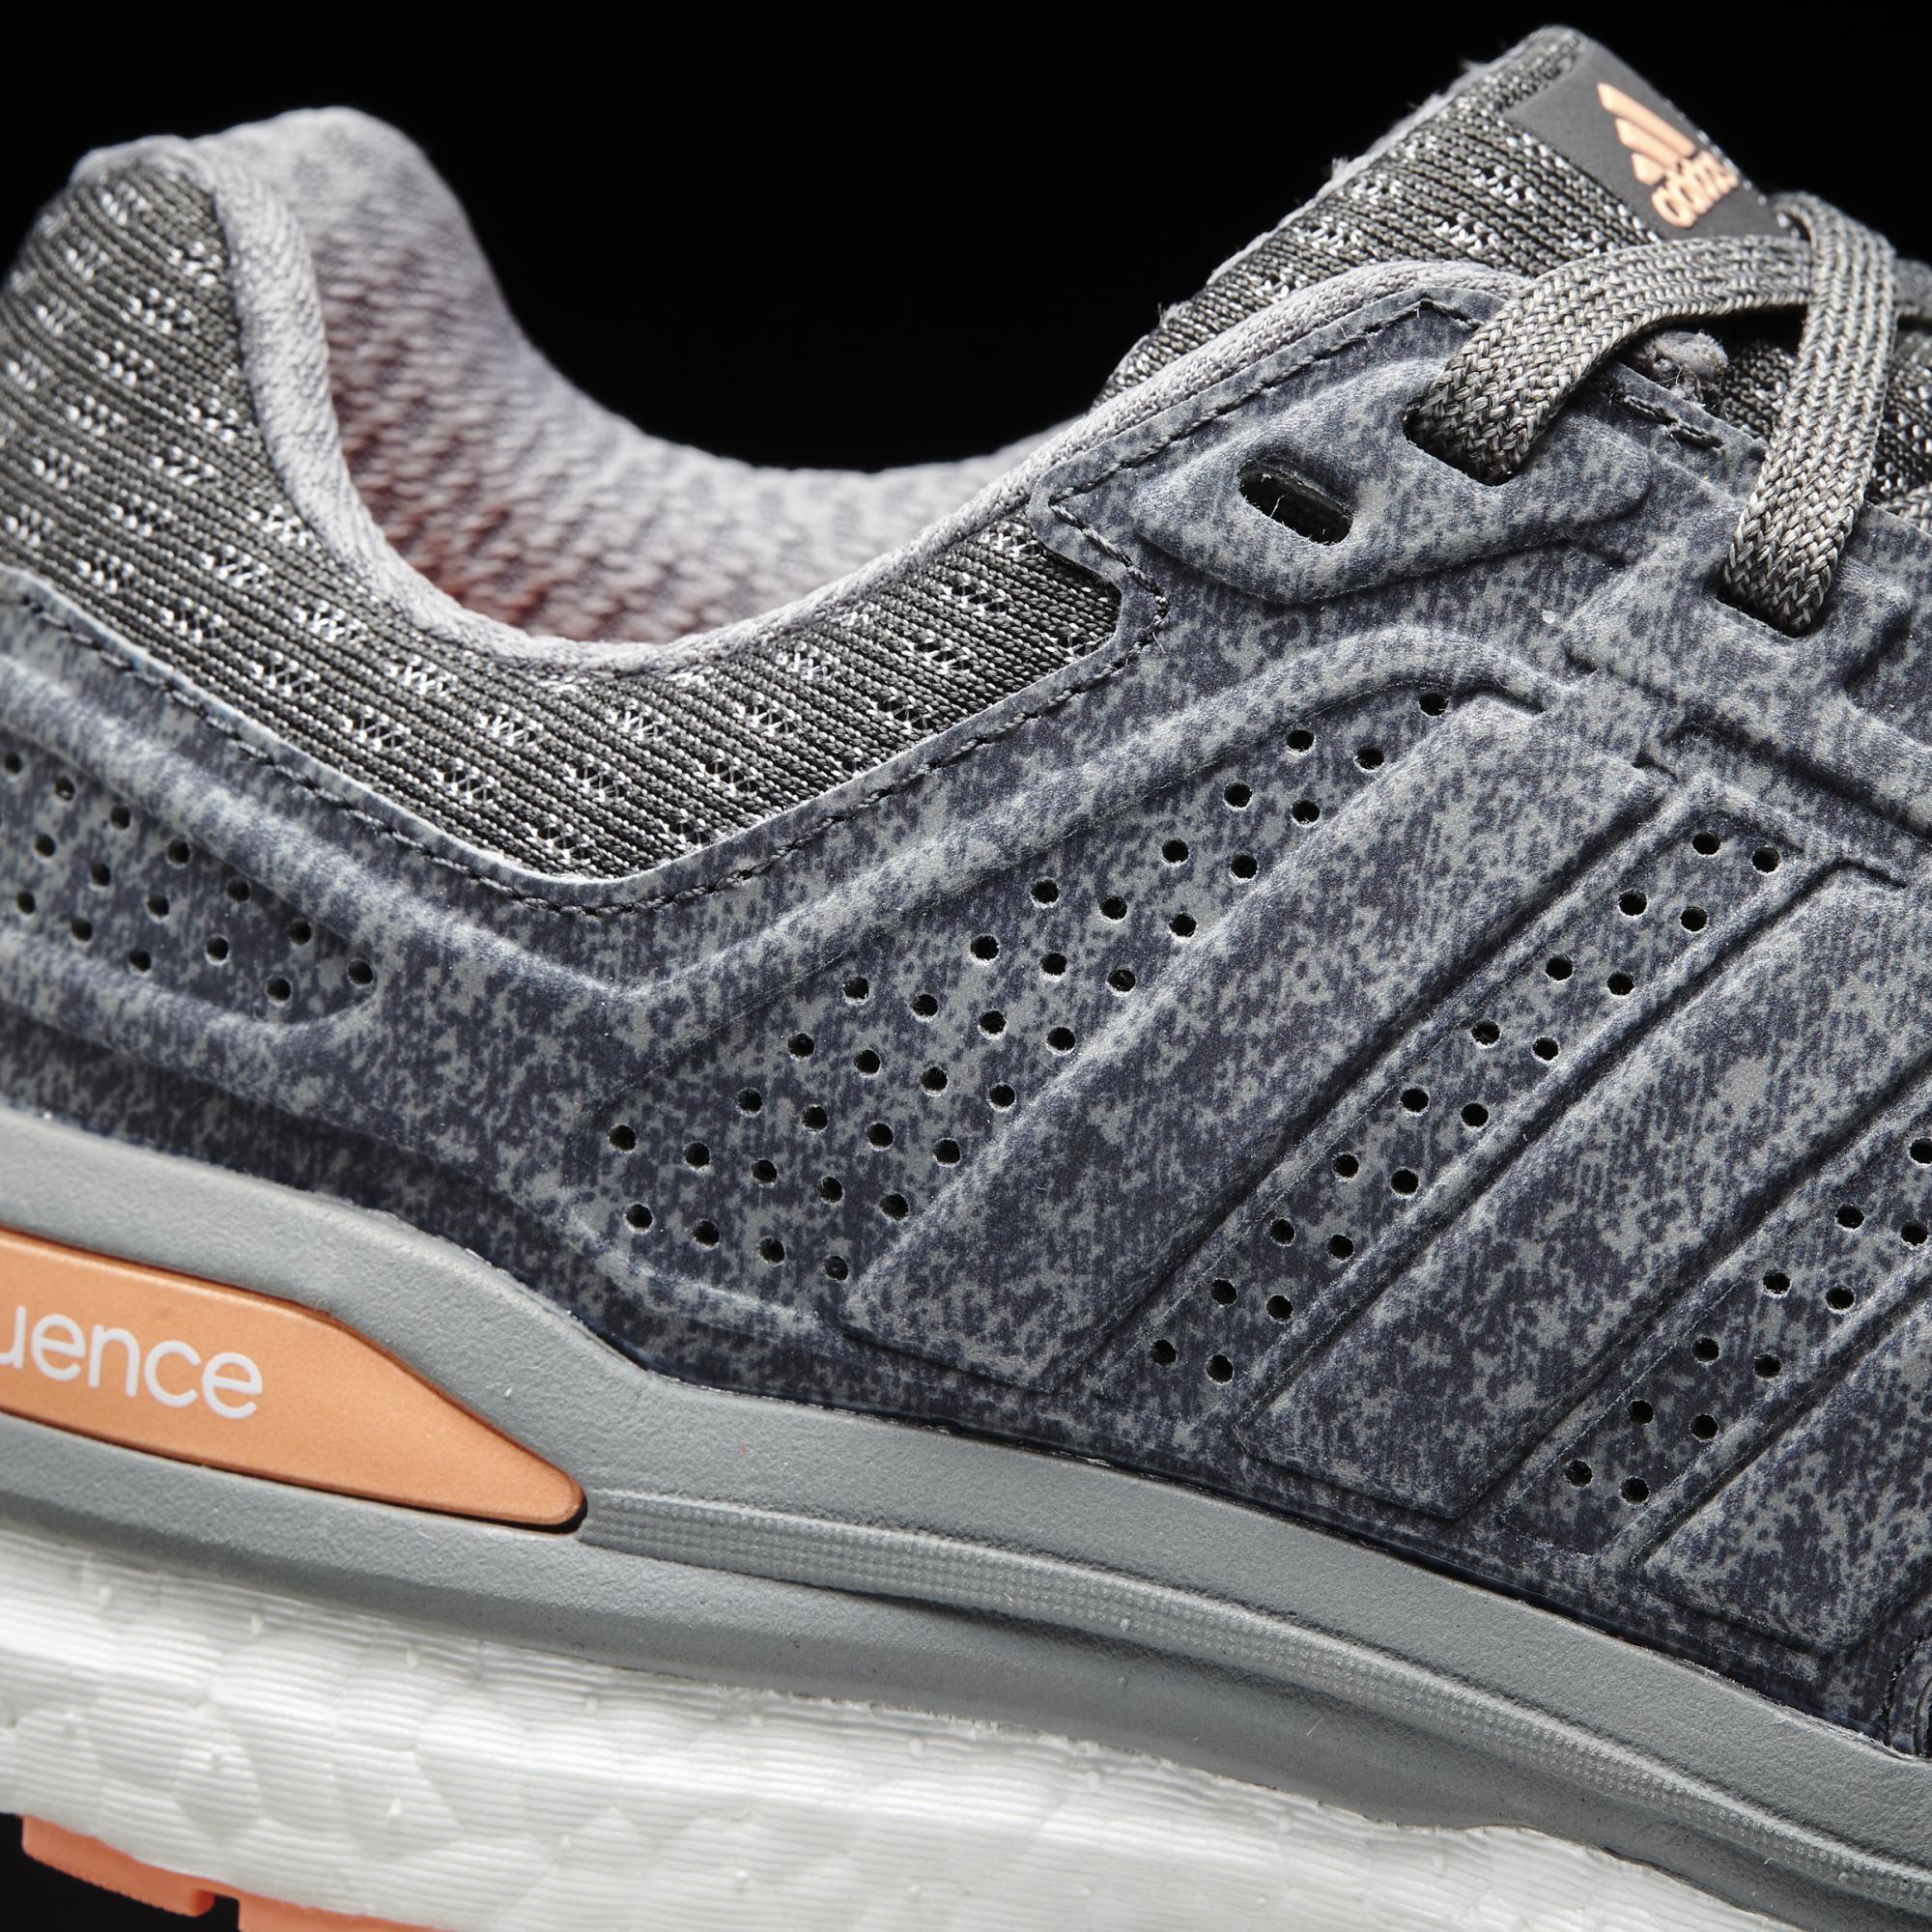 23bafbd981c30 Adidas Womens Supernova Sequence 8 Boost Running Shoes - Grey ...